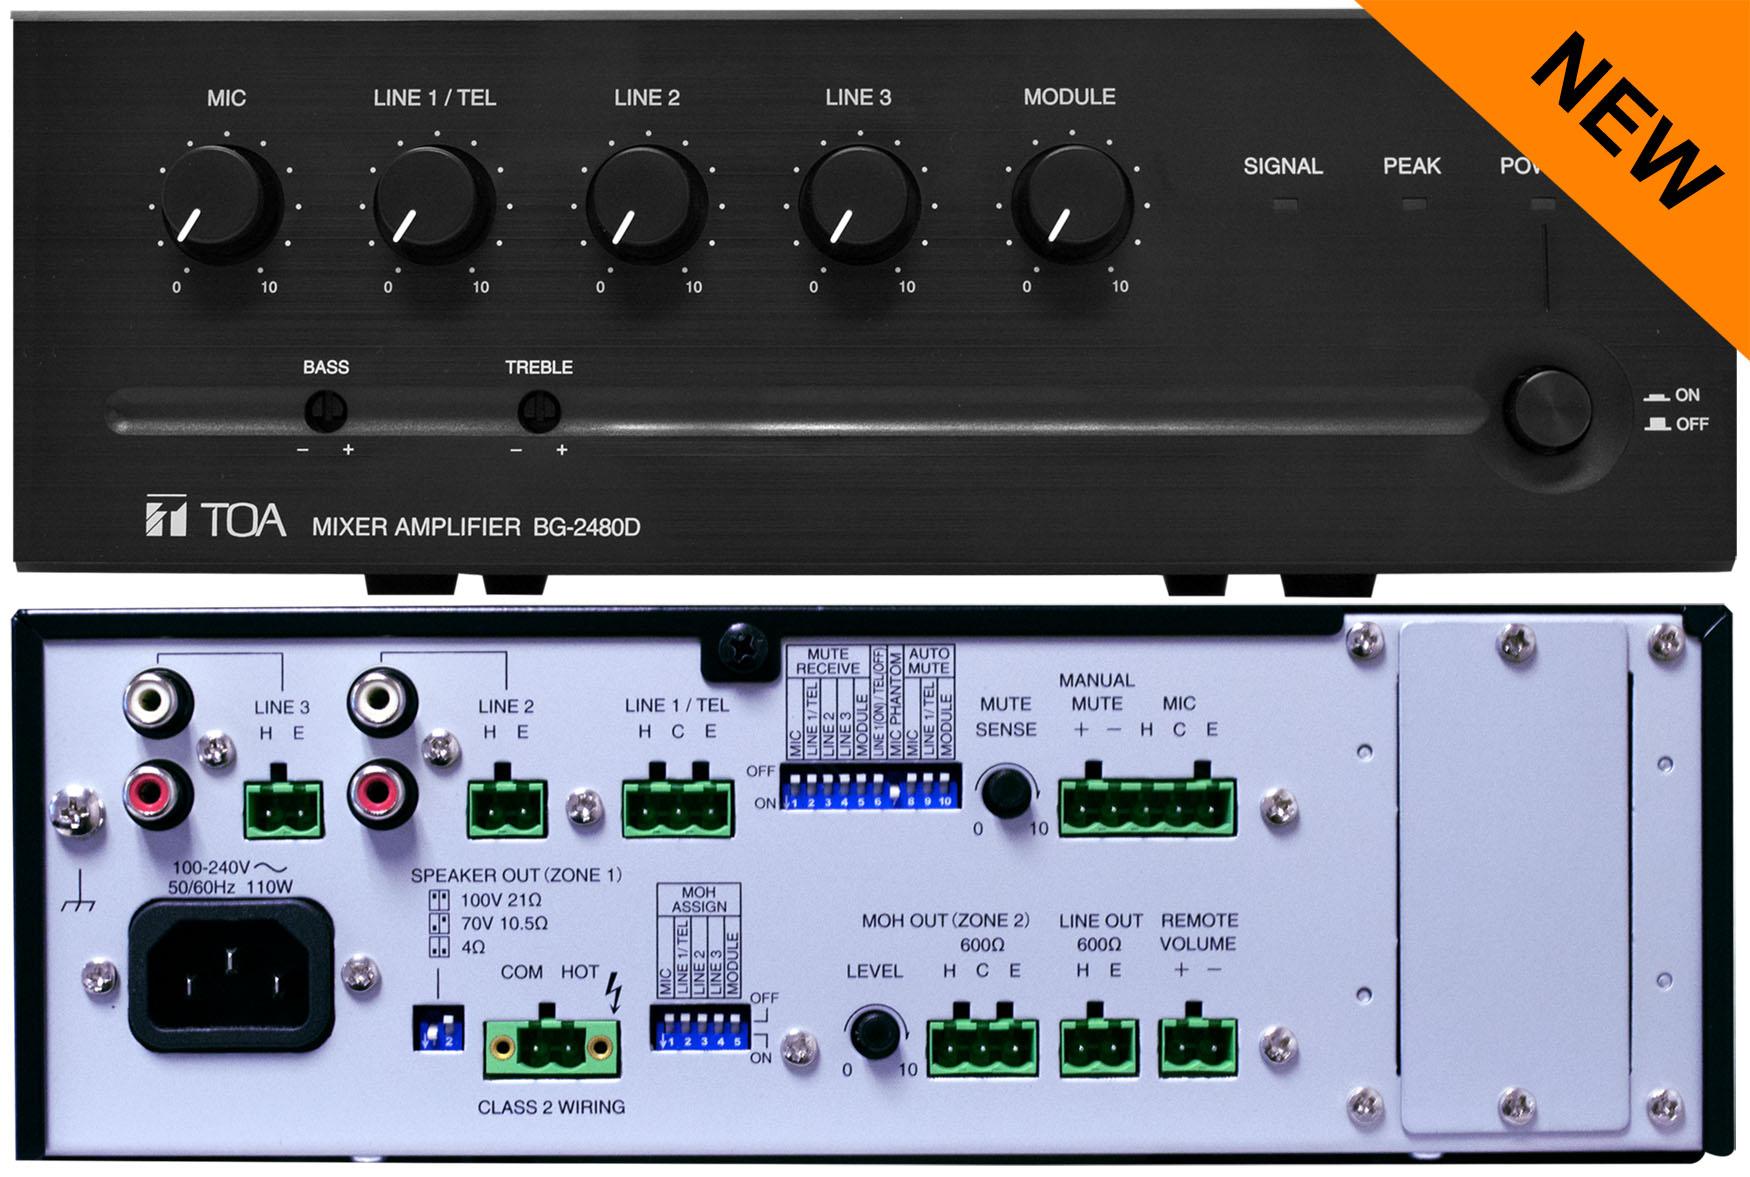 bg 2480d am mixer amplifier rh toacanada com Toa BG 1030 Toa Amplifier 900 Series Manual